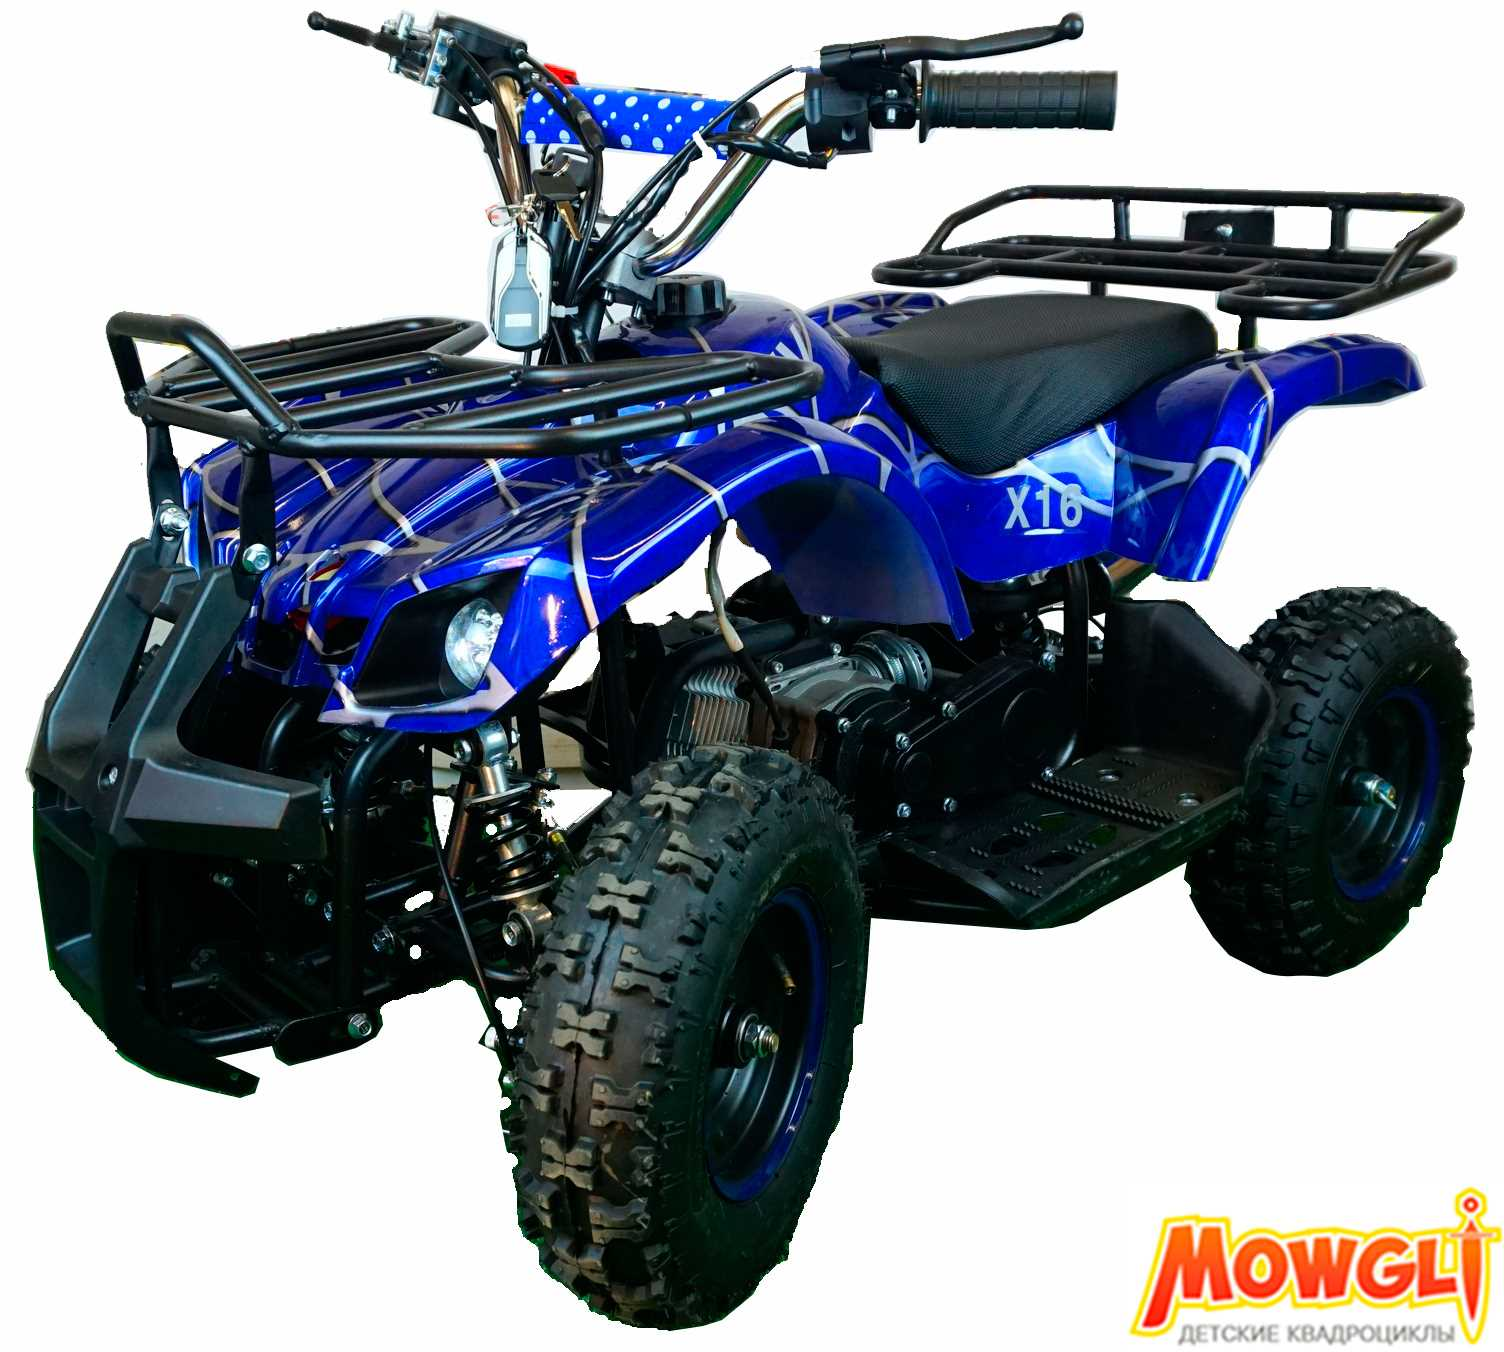 ATV MOWGLI X 16